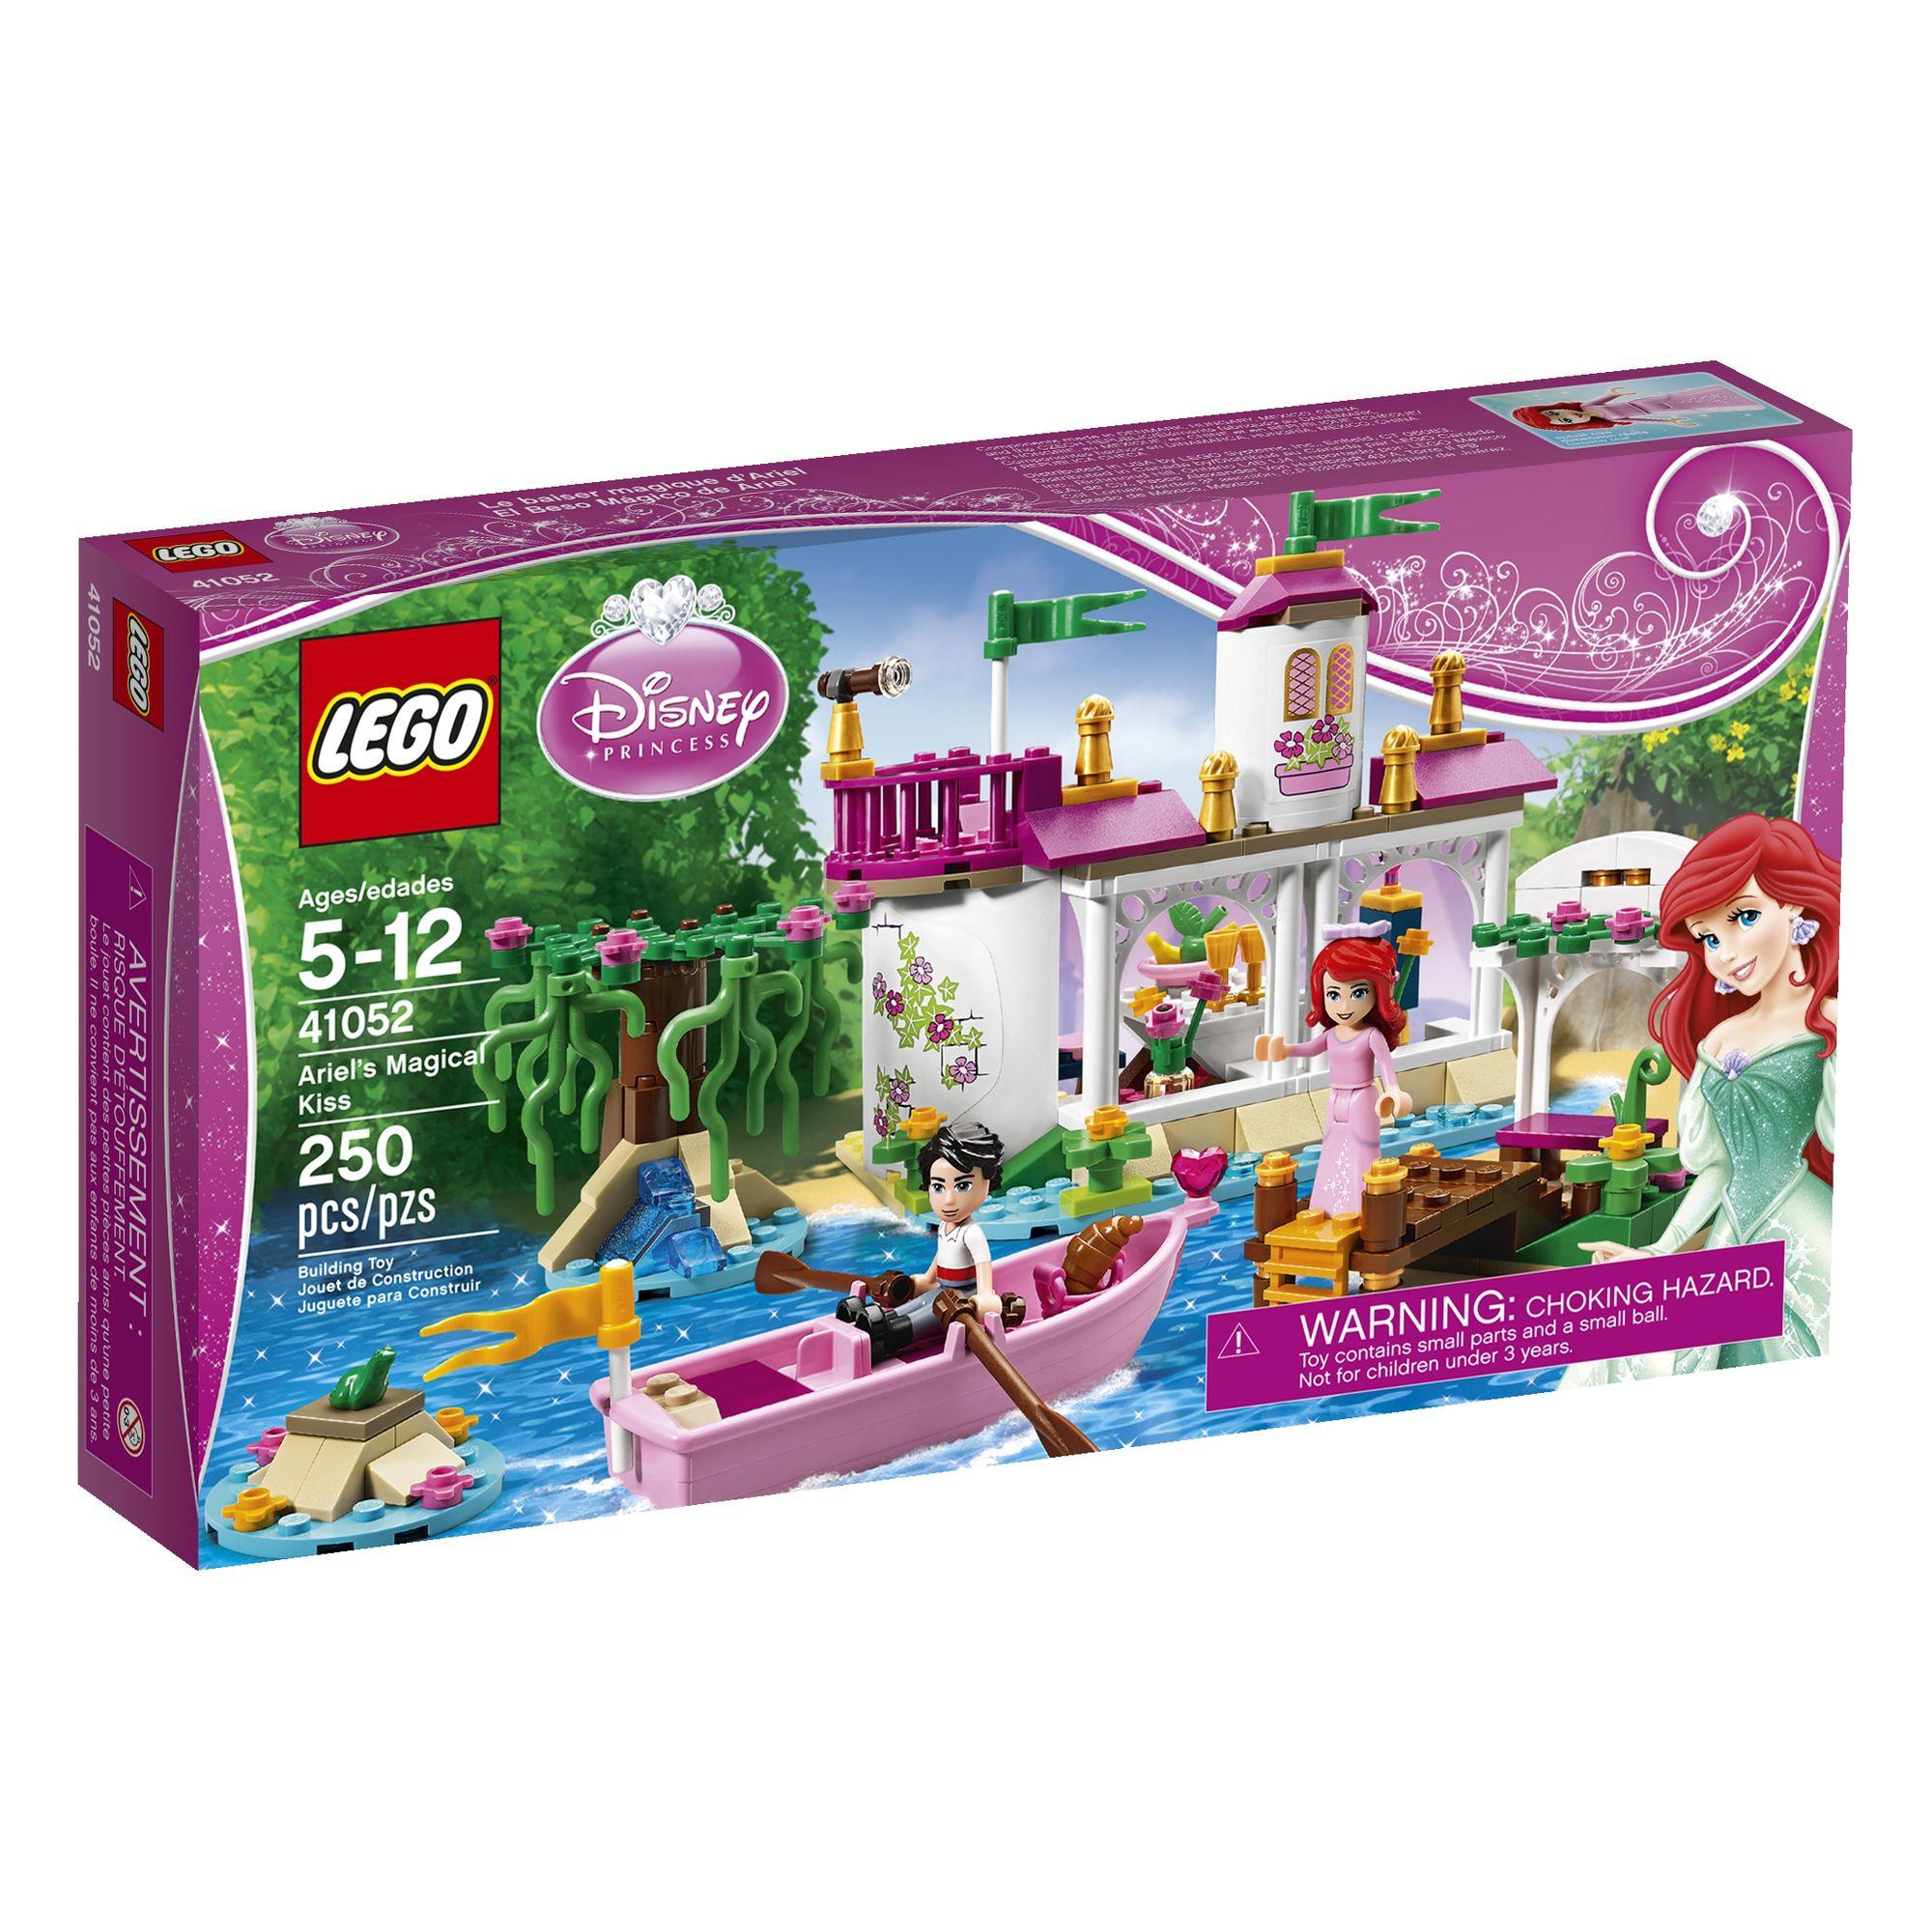 41052 Ariels Magical Kiss Brickipedia Fandom Powered By Wikia Lego 41060 Disney Princess Sleeping Beautyamp039s Royal Bedroom